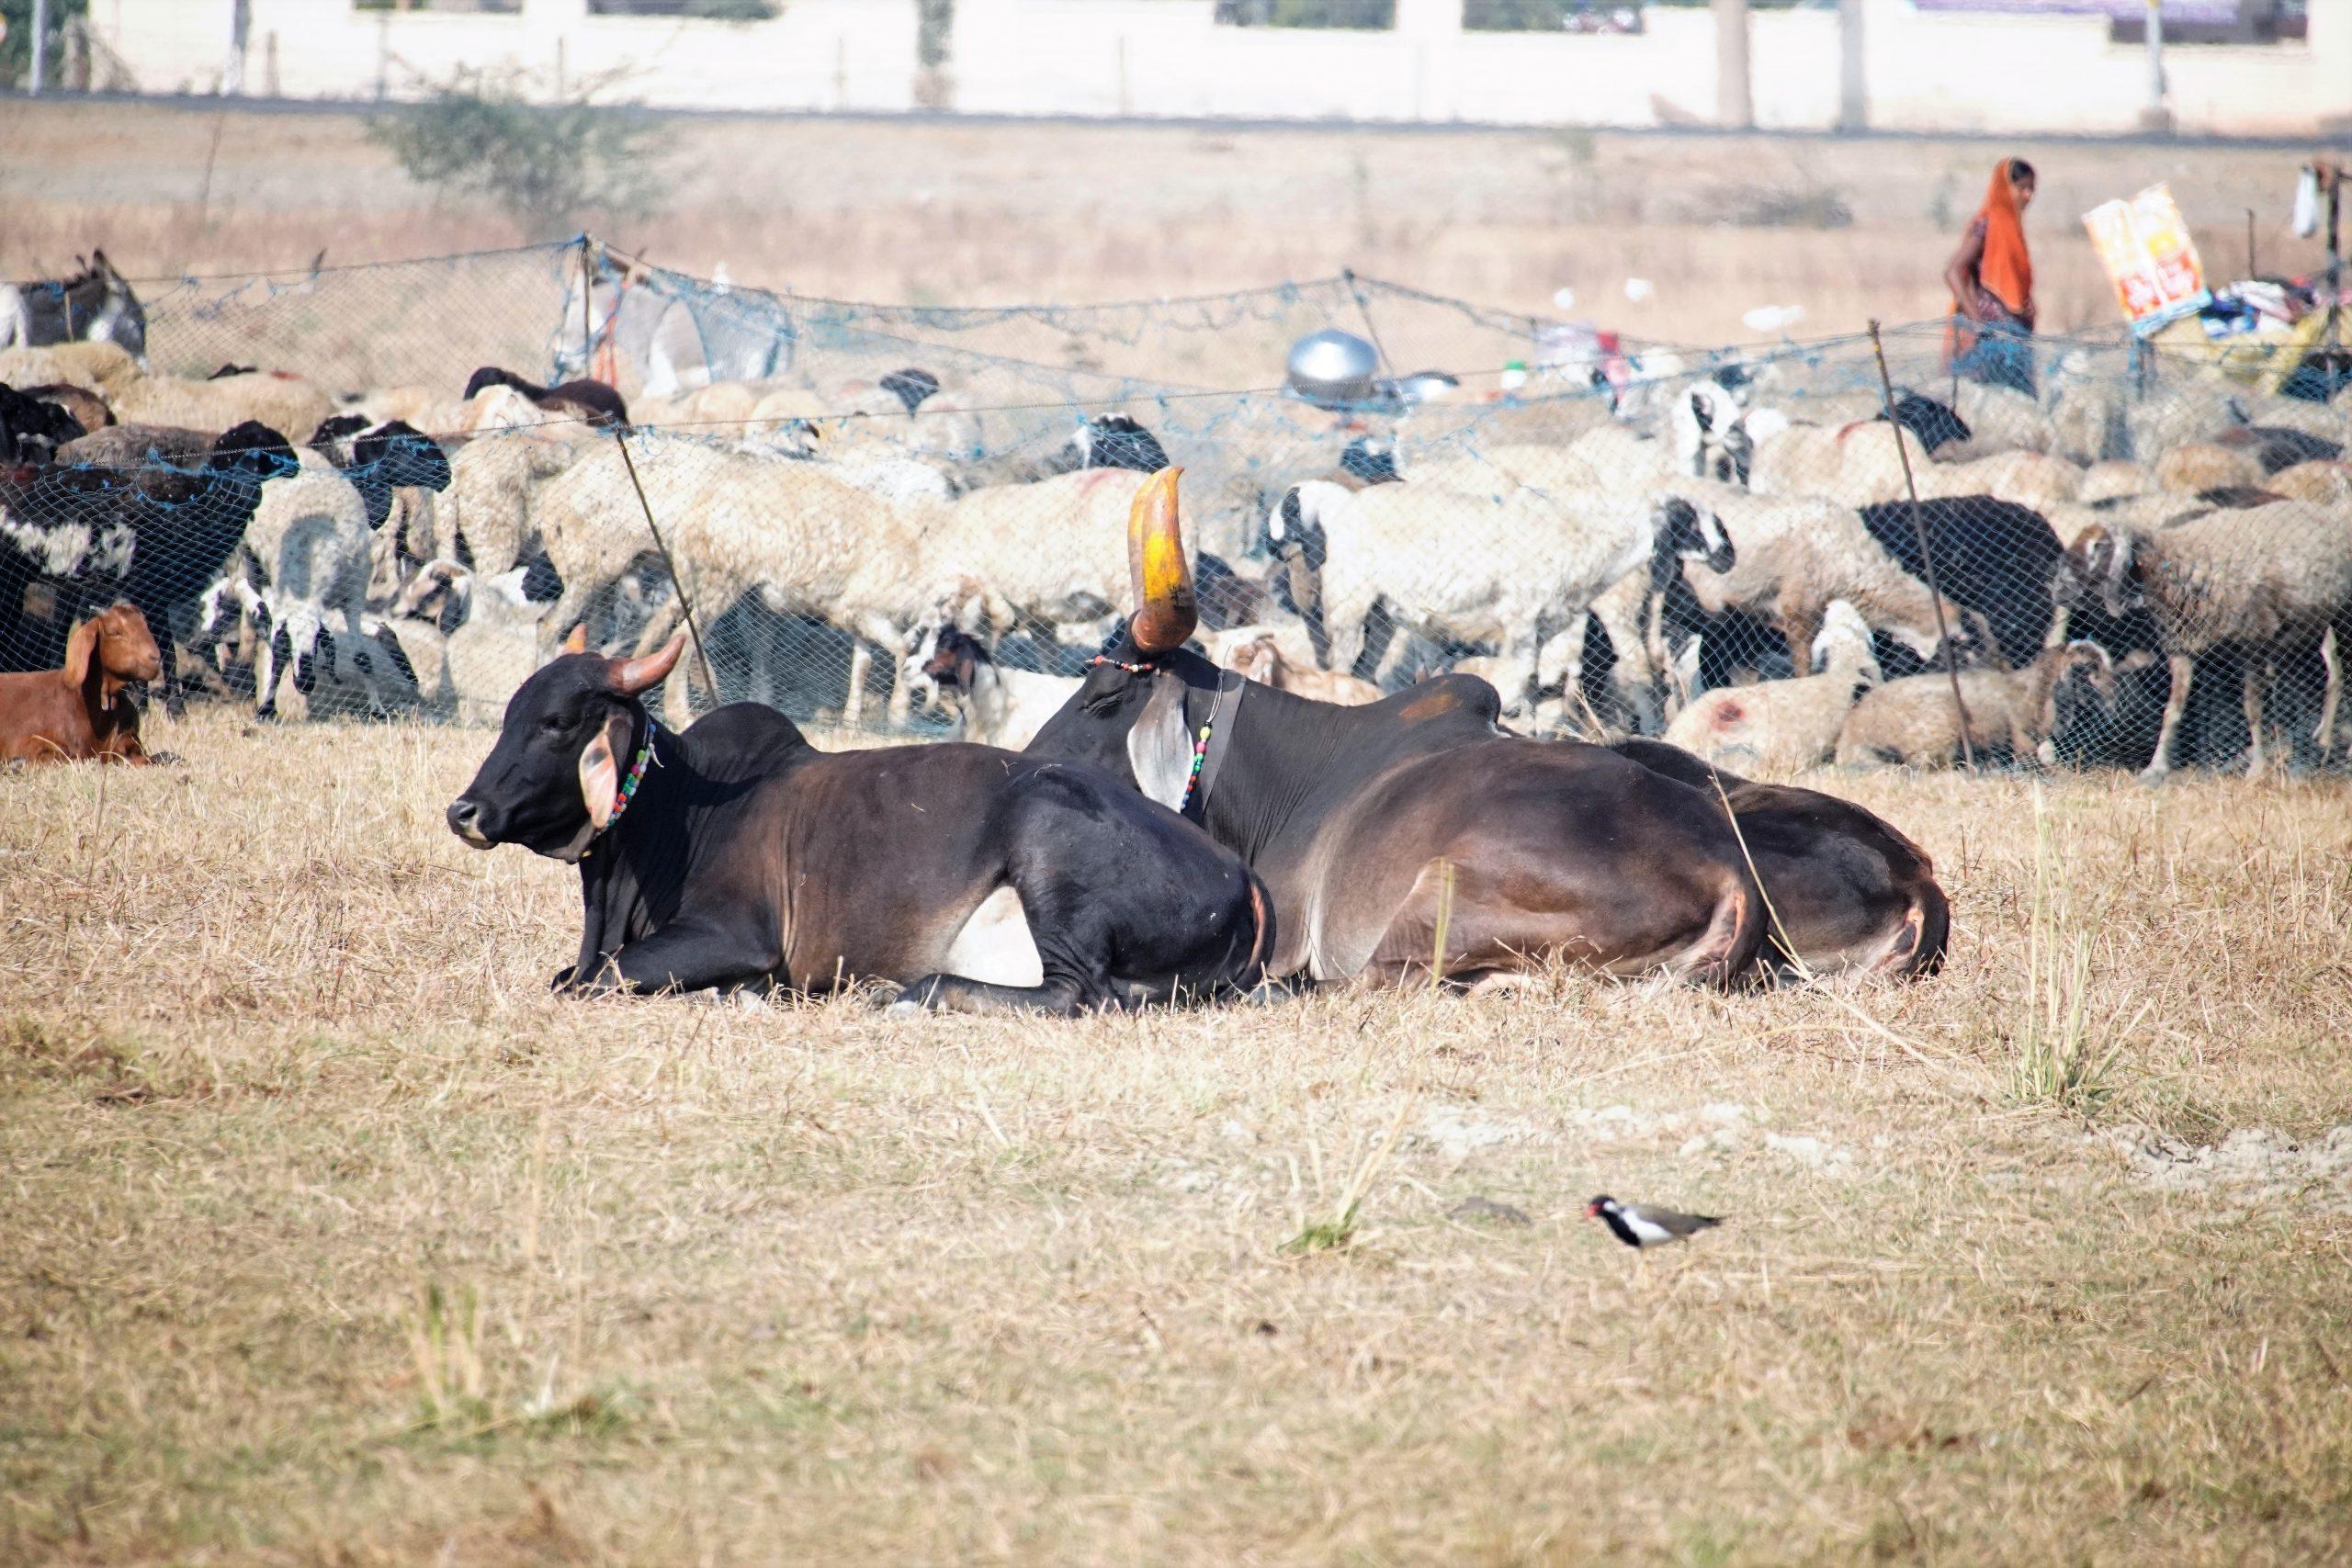 Livestock sitting in a herd